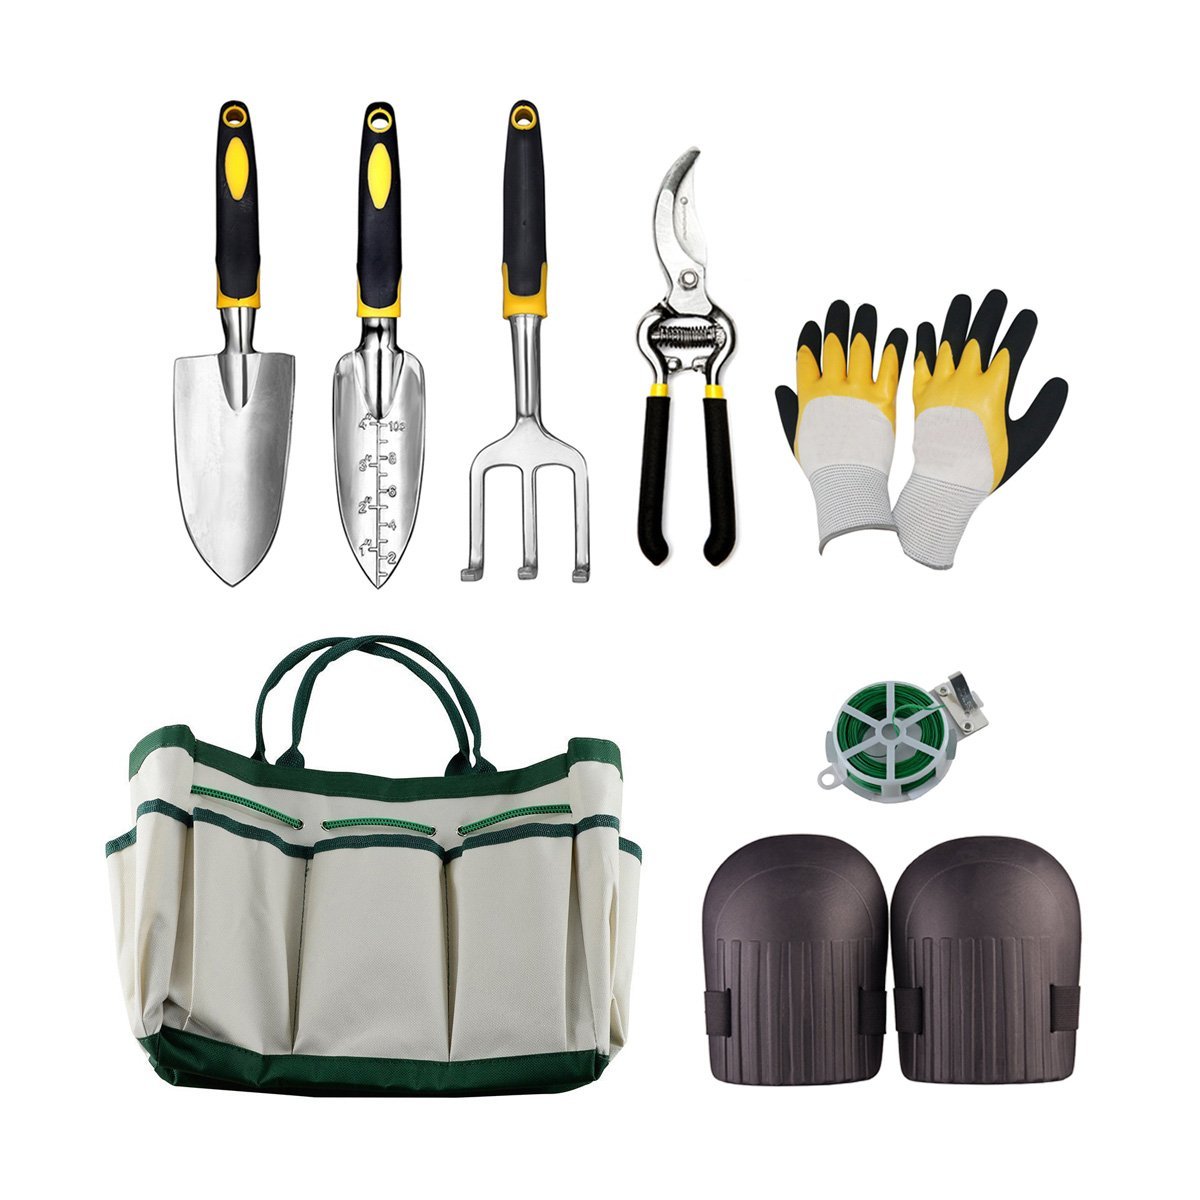 Garden Tool Set Aluminum Hand Tool Kit,Outdoor Tool,Garden Tote,Vegetable Herb Garden Hand Tools